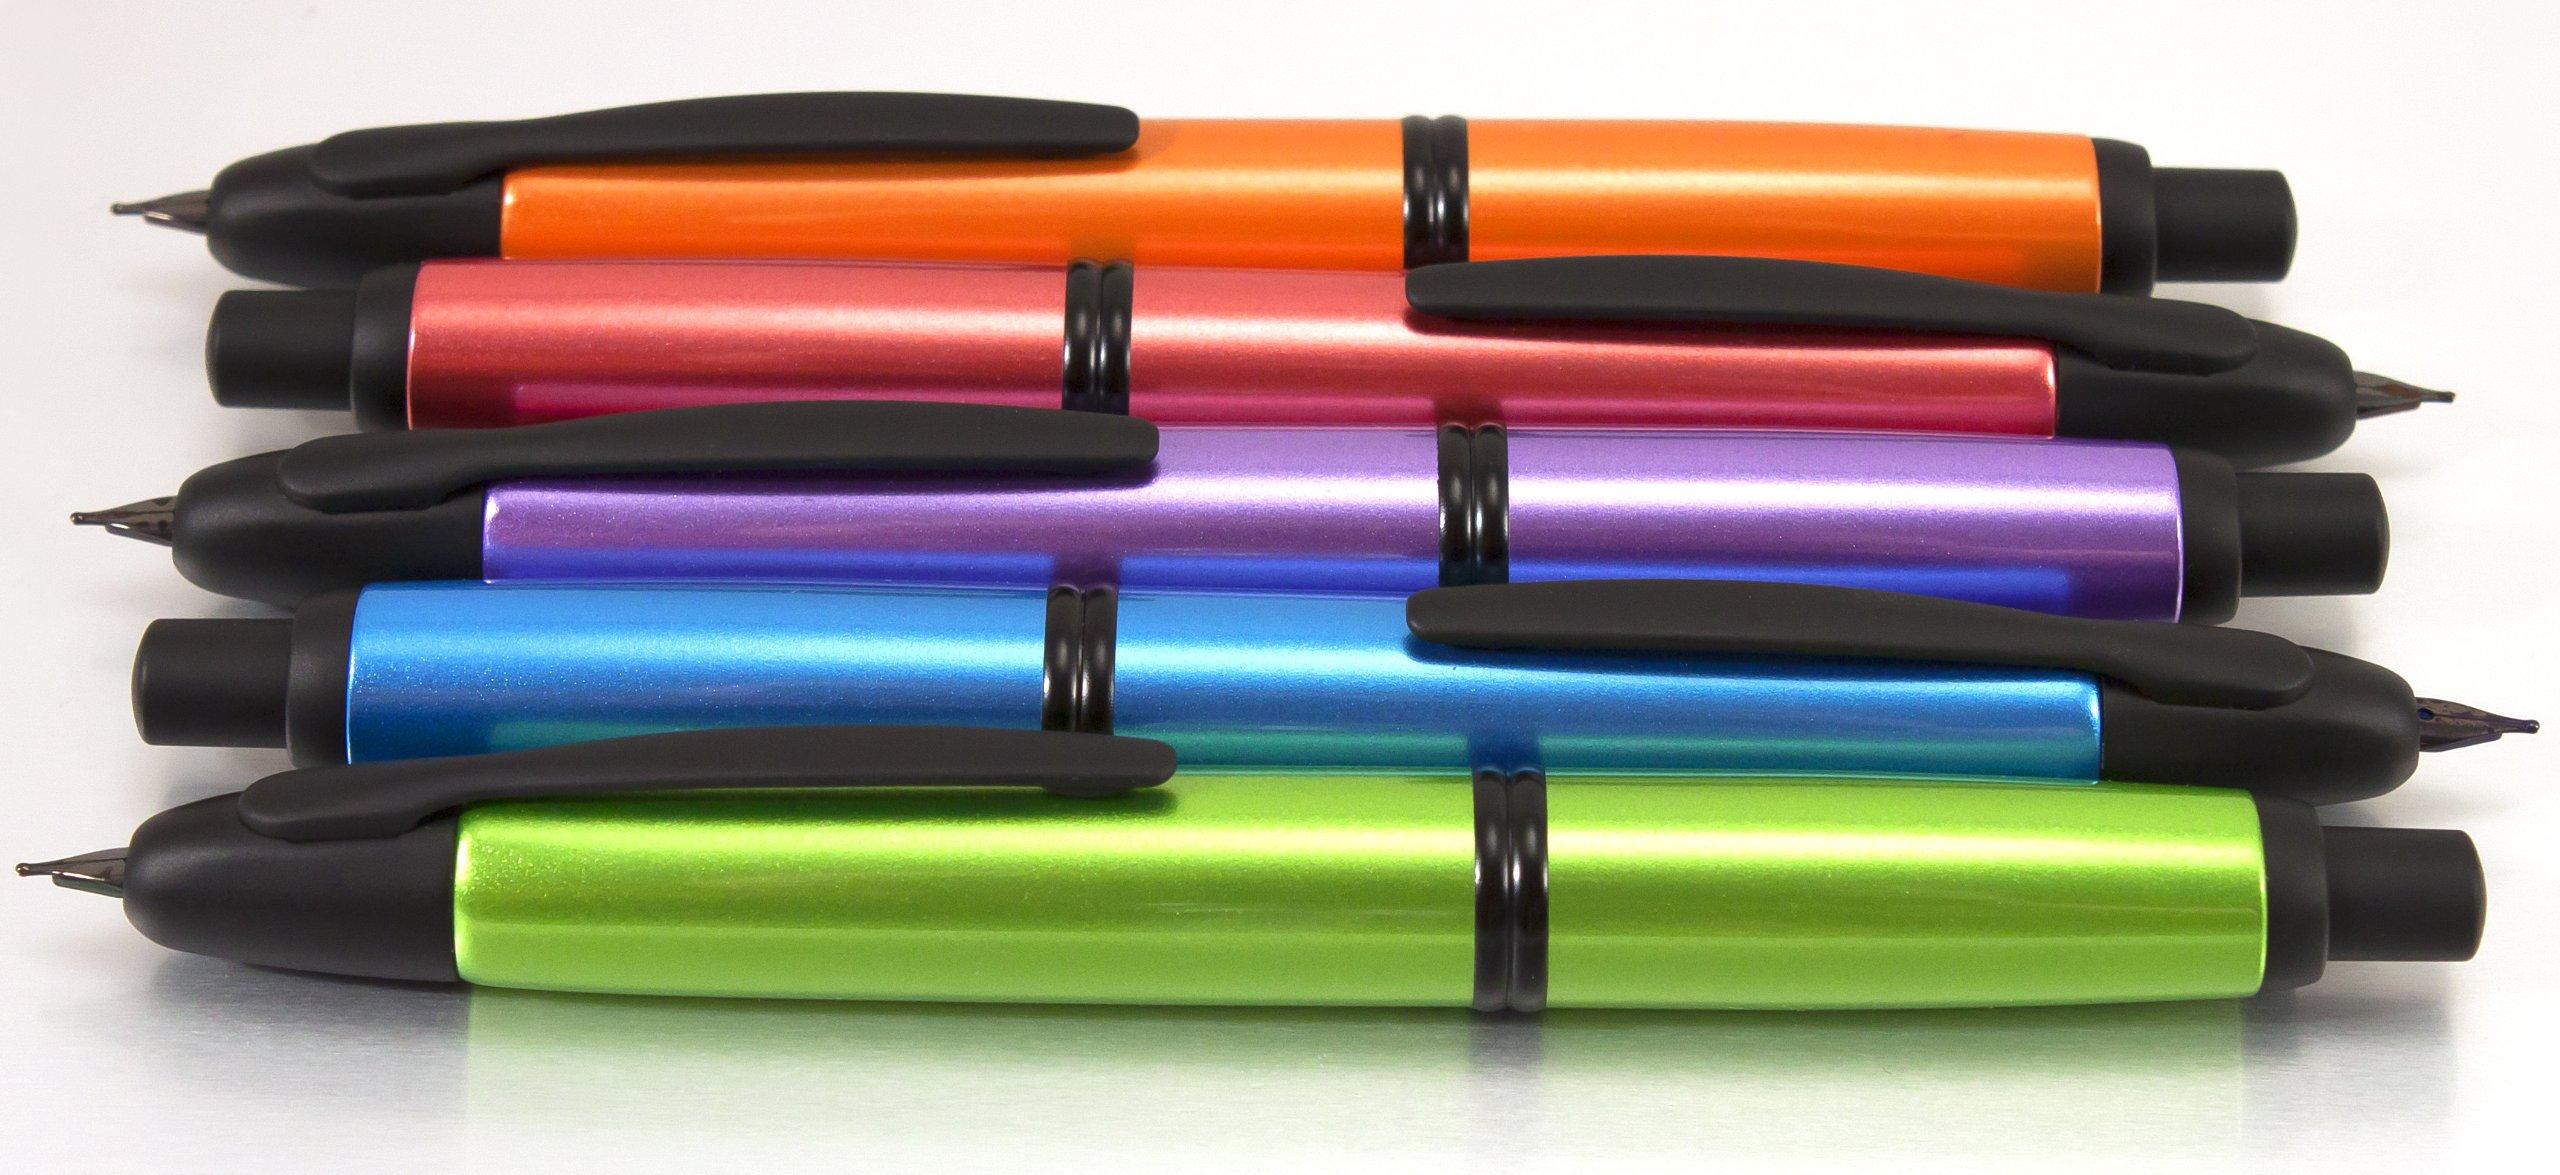 Pilot Vanishing Point Metallics Collection Retractable Fountain Pen, Valley Green Barrel, Blue Ink, Medium Nib (61095) by Pilot (Image #9)